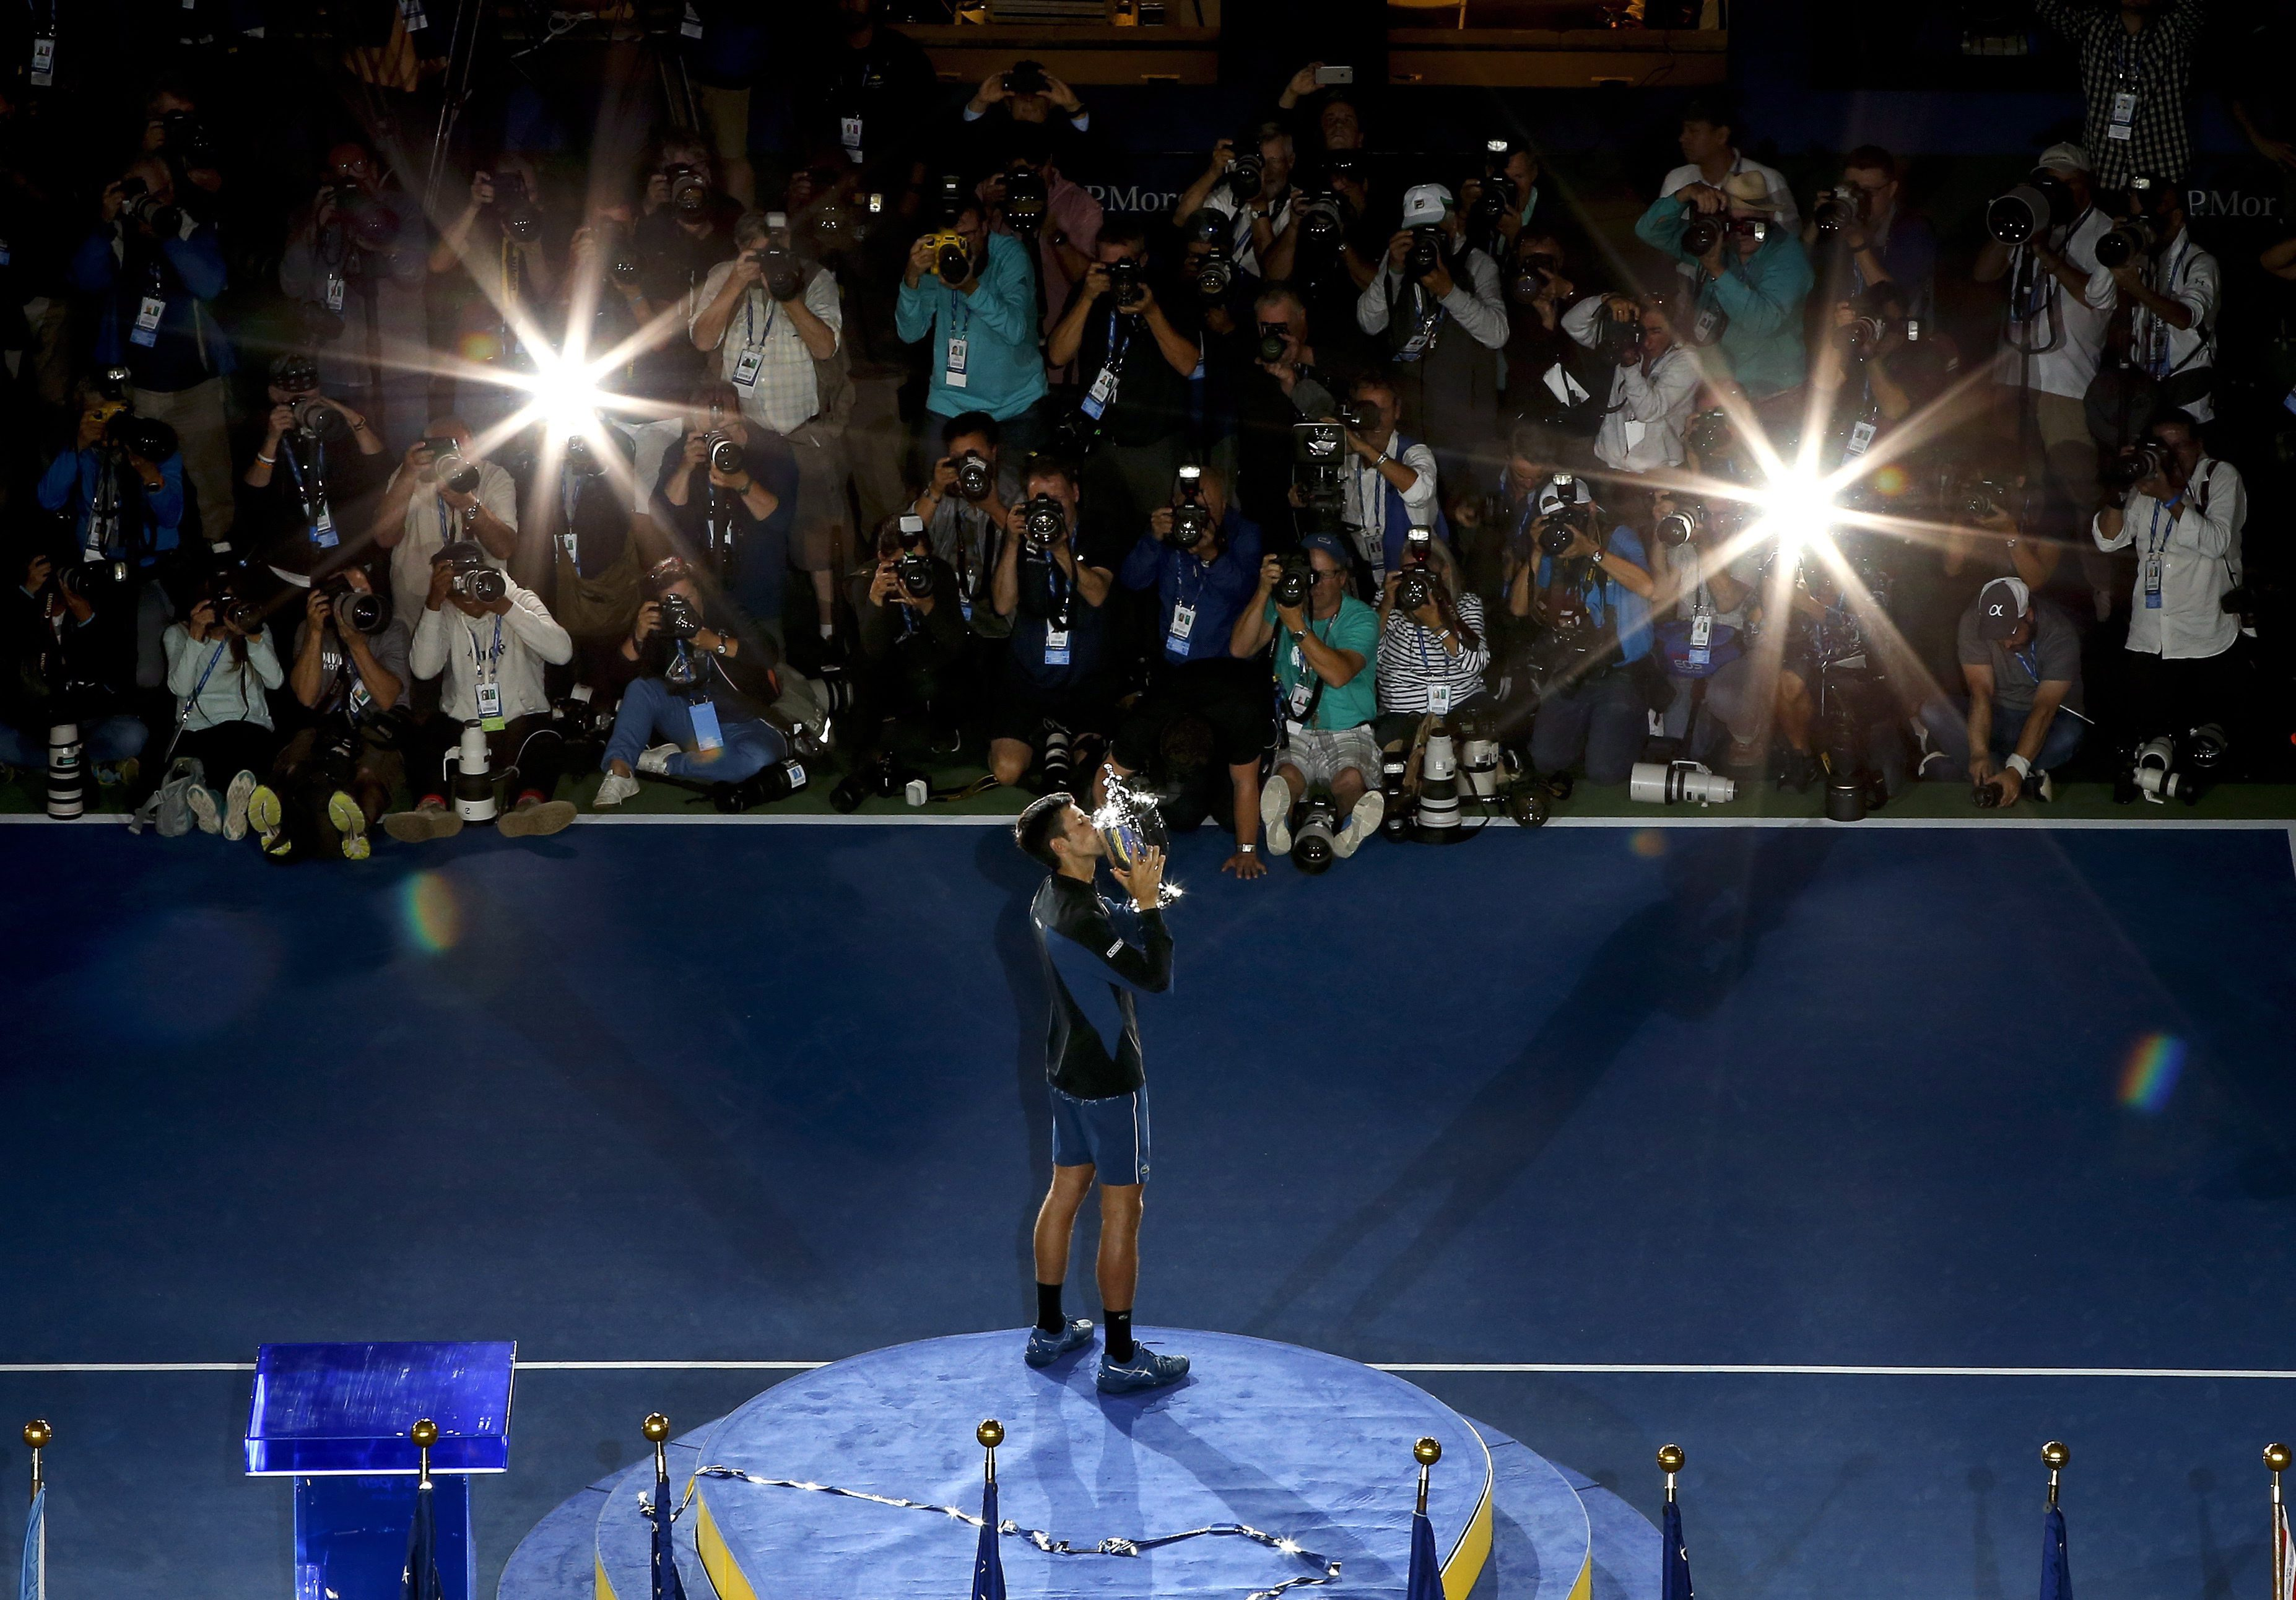 Novak Djokovic kisses the US Open trophy